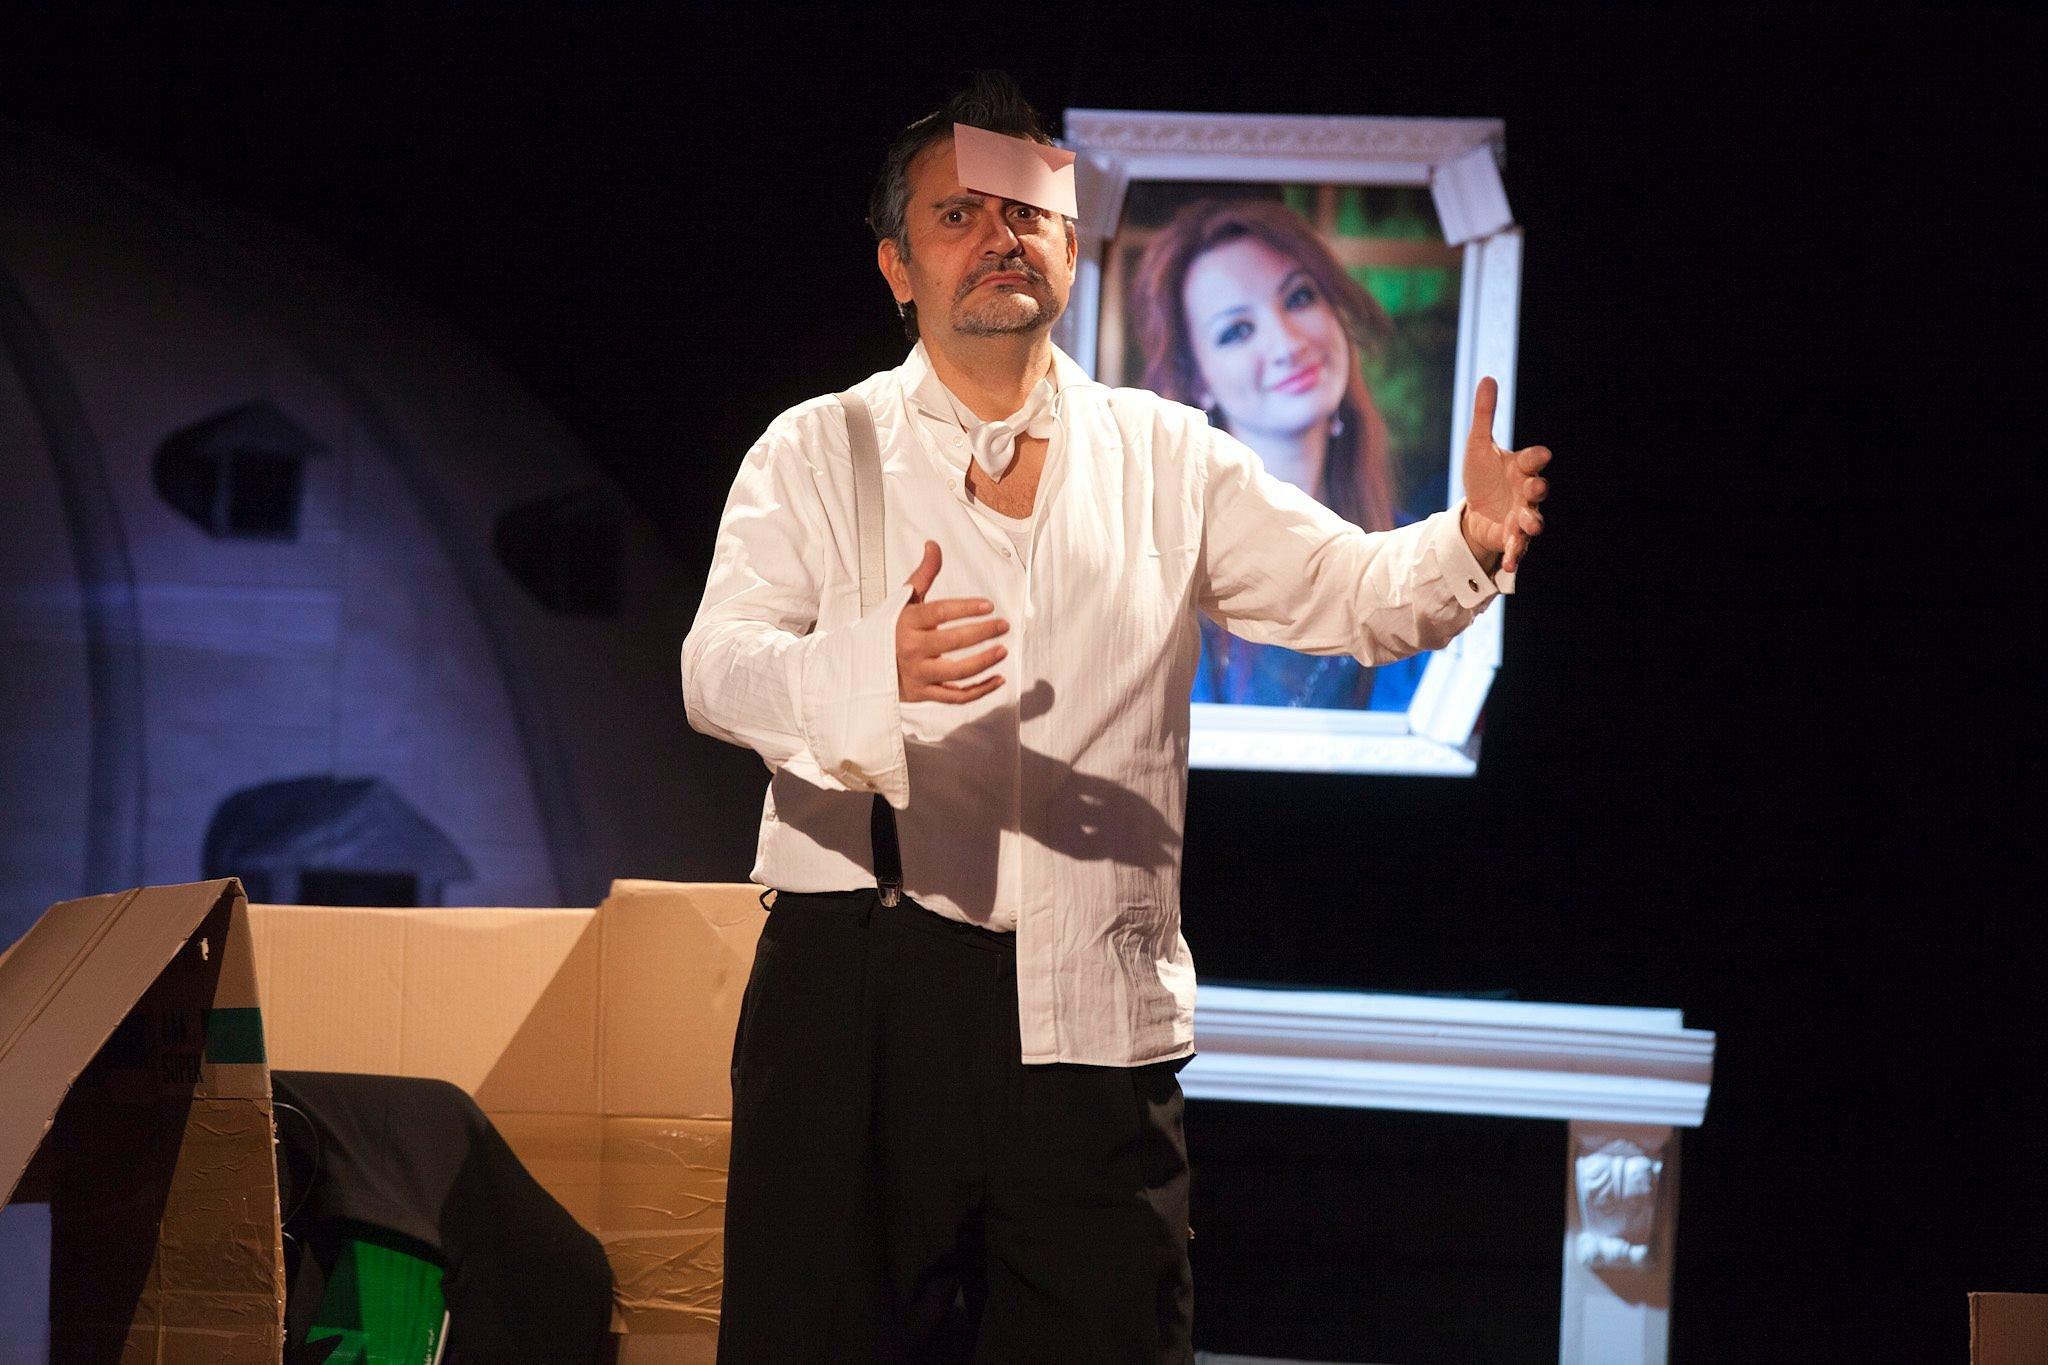 Don Pasquale 2013